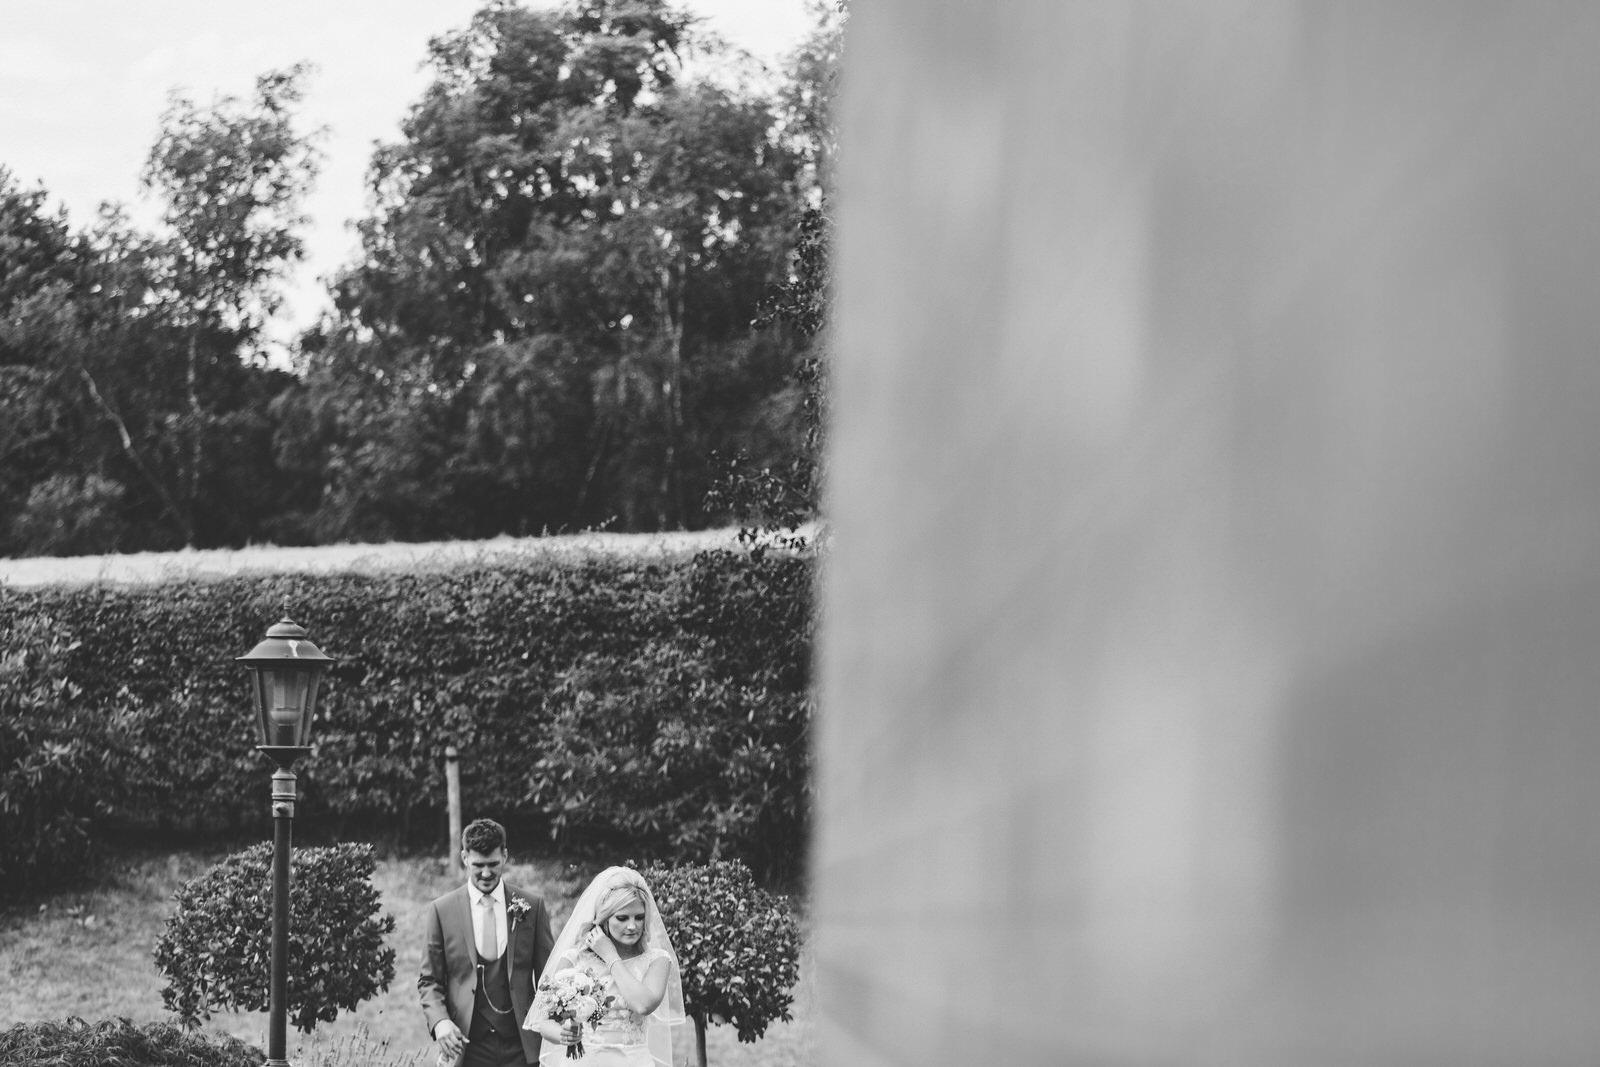 Moddershall-Oaks-Spa-Wedding-Photographer-029.jpg